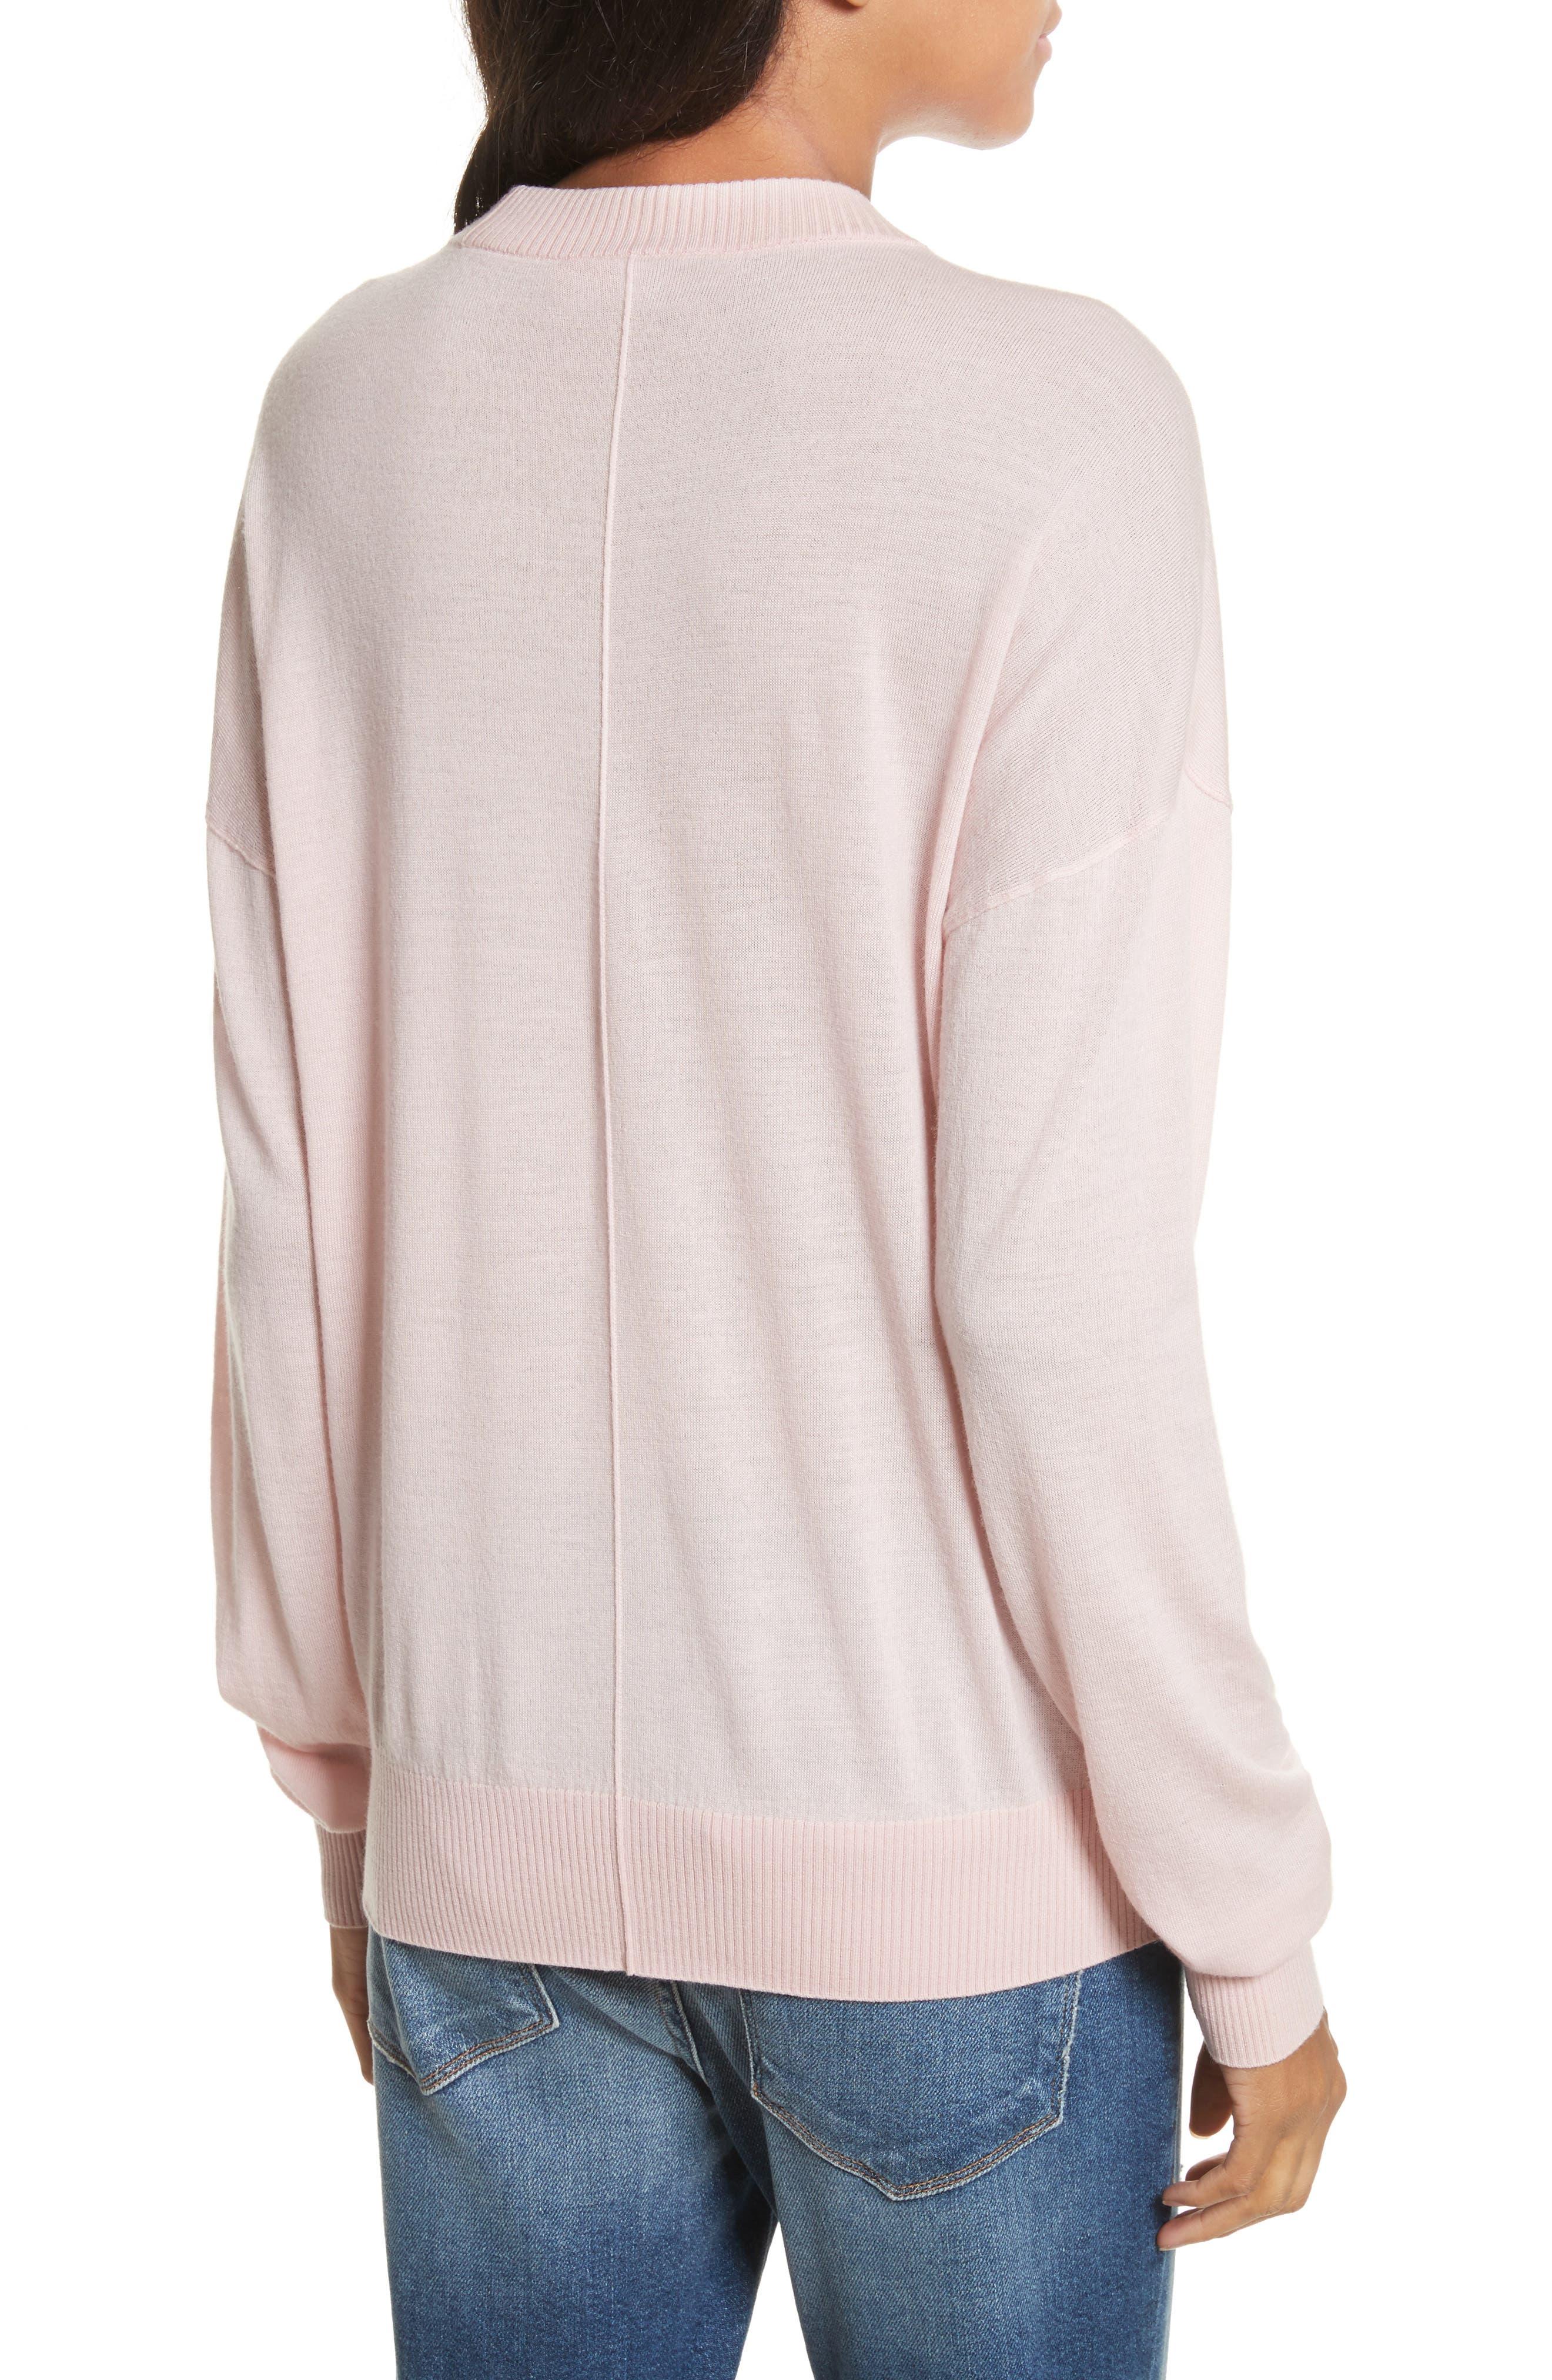 True Crewneck Wool Sweater,                             Alternate thumbnail 2, color,                             Powder Pink